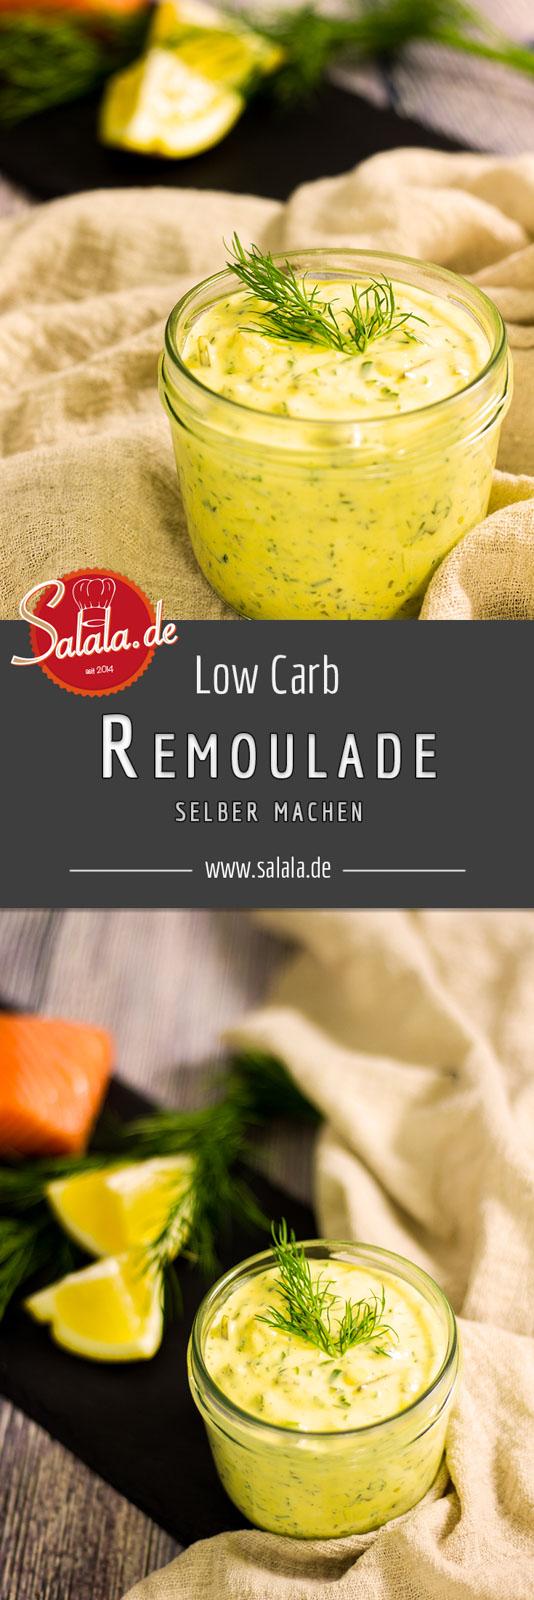 Remoulade selber machen Rezept ohne Zucker Low Carb